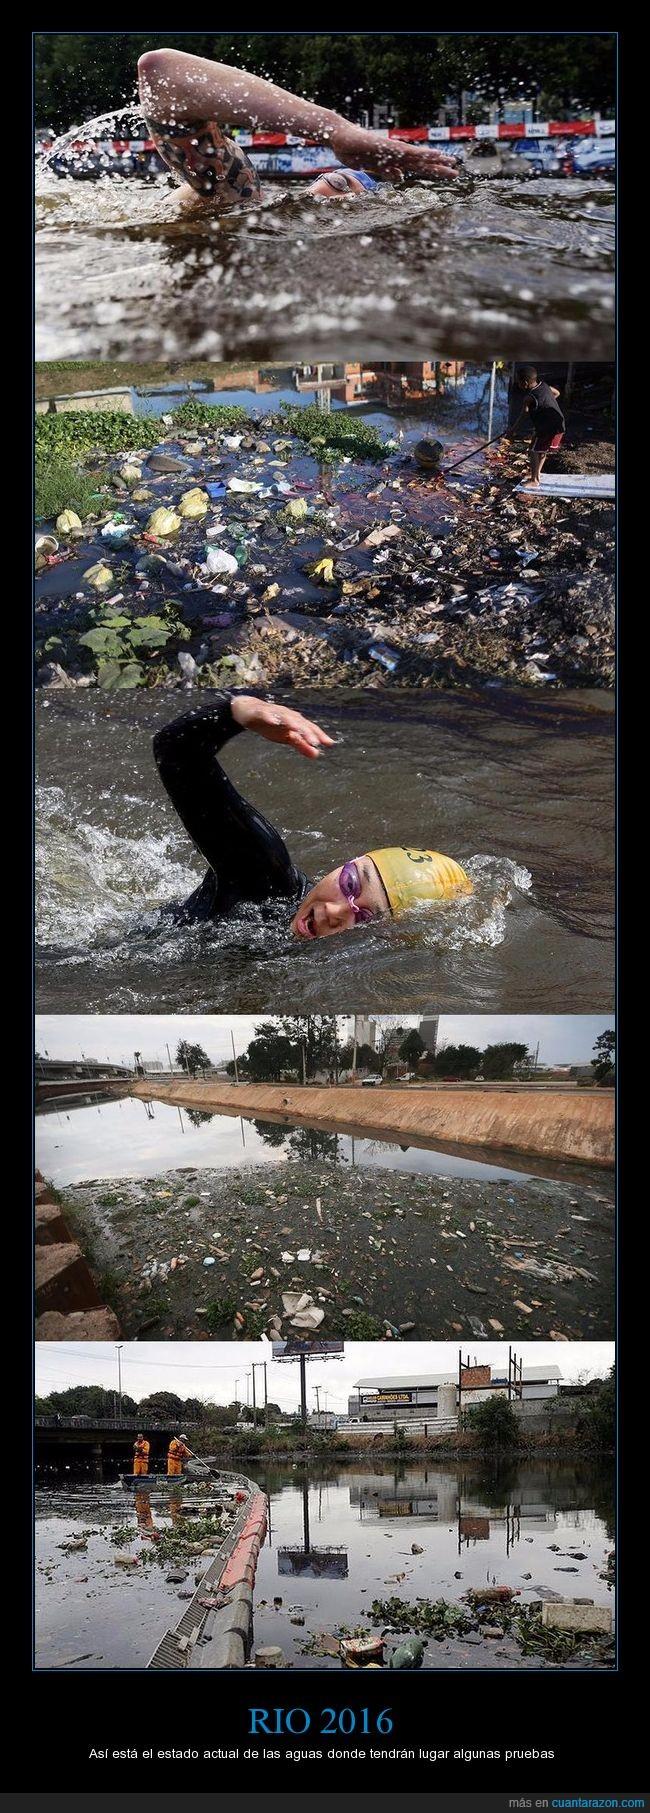 agua sucia,jjoo,juegos olímpicos,rio 2016